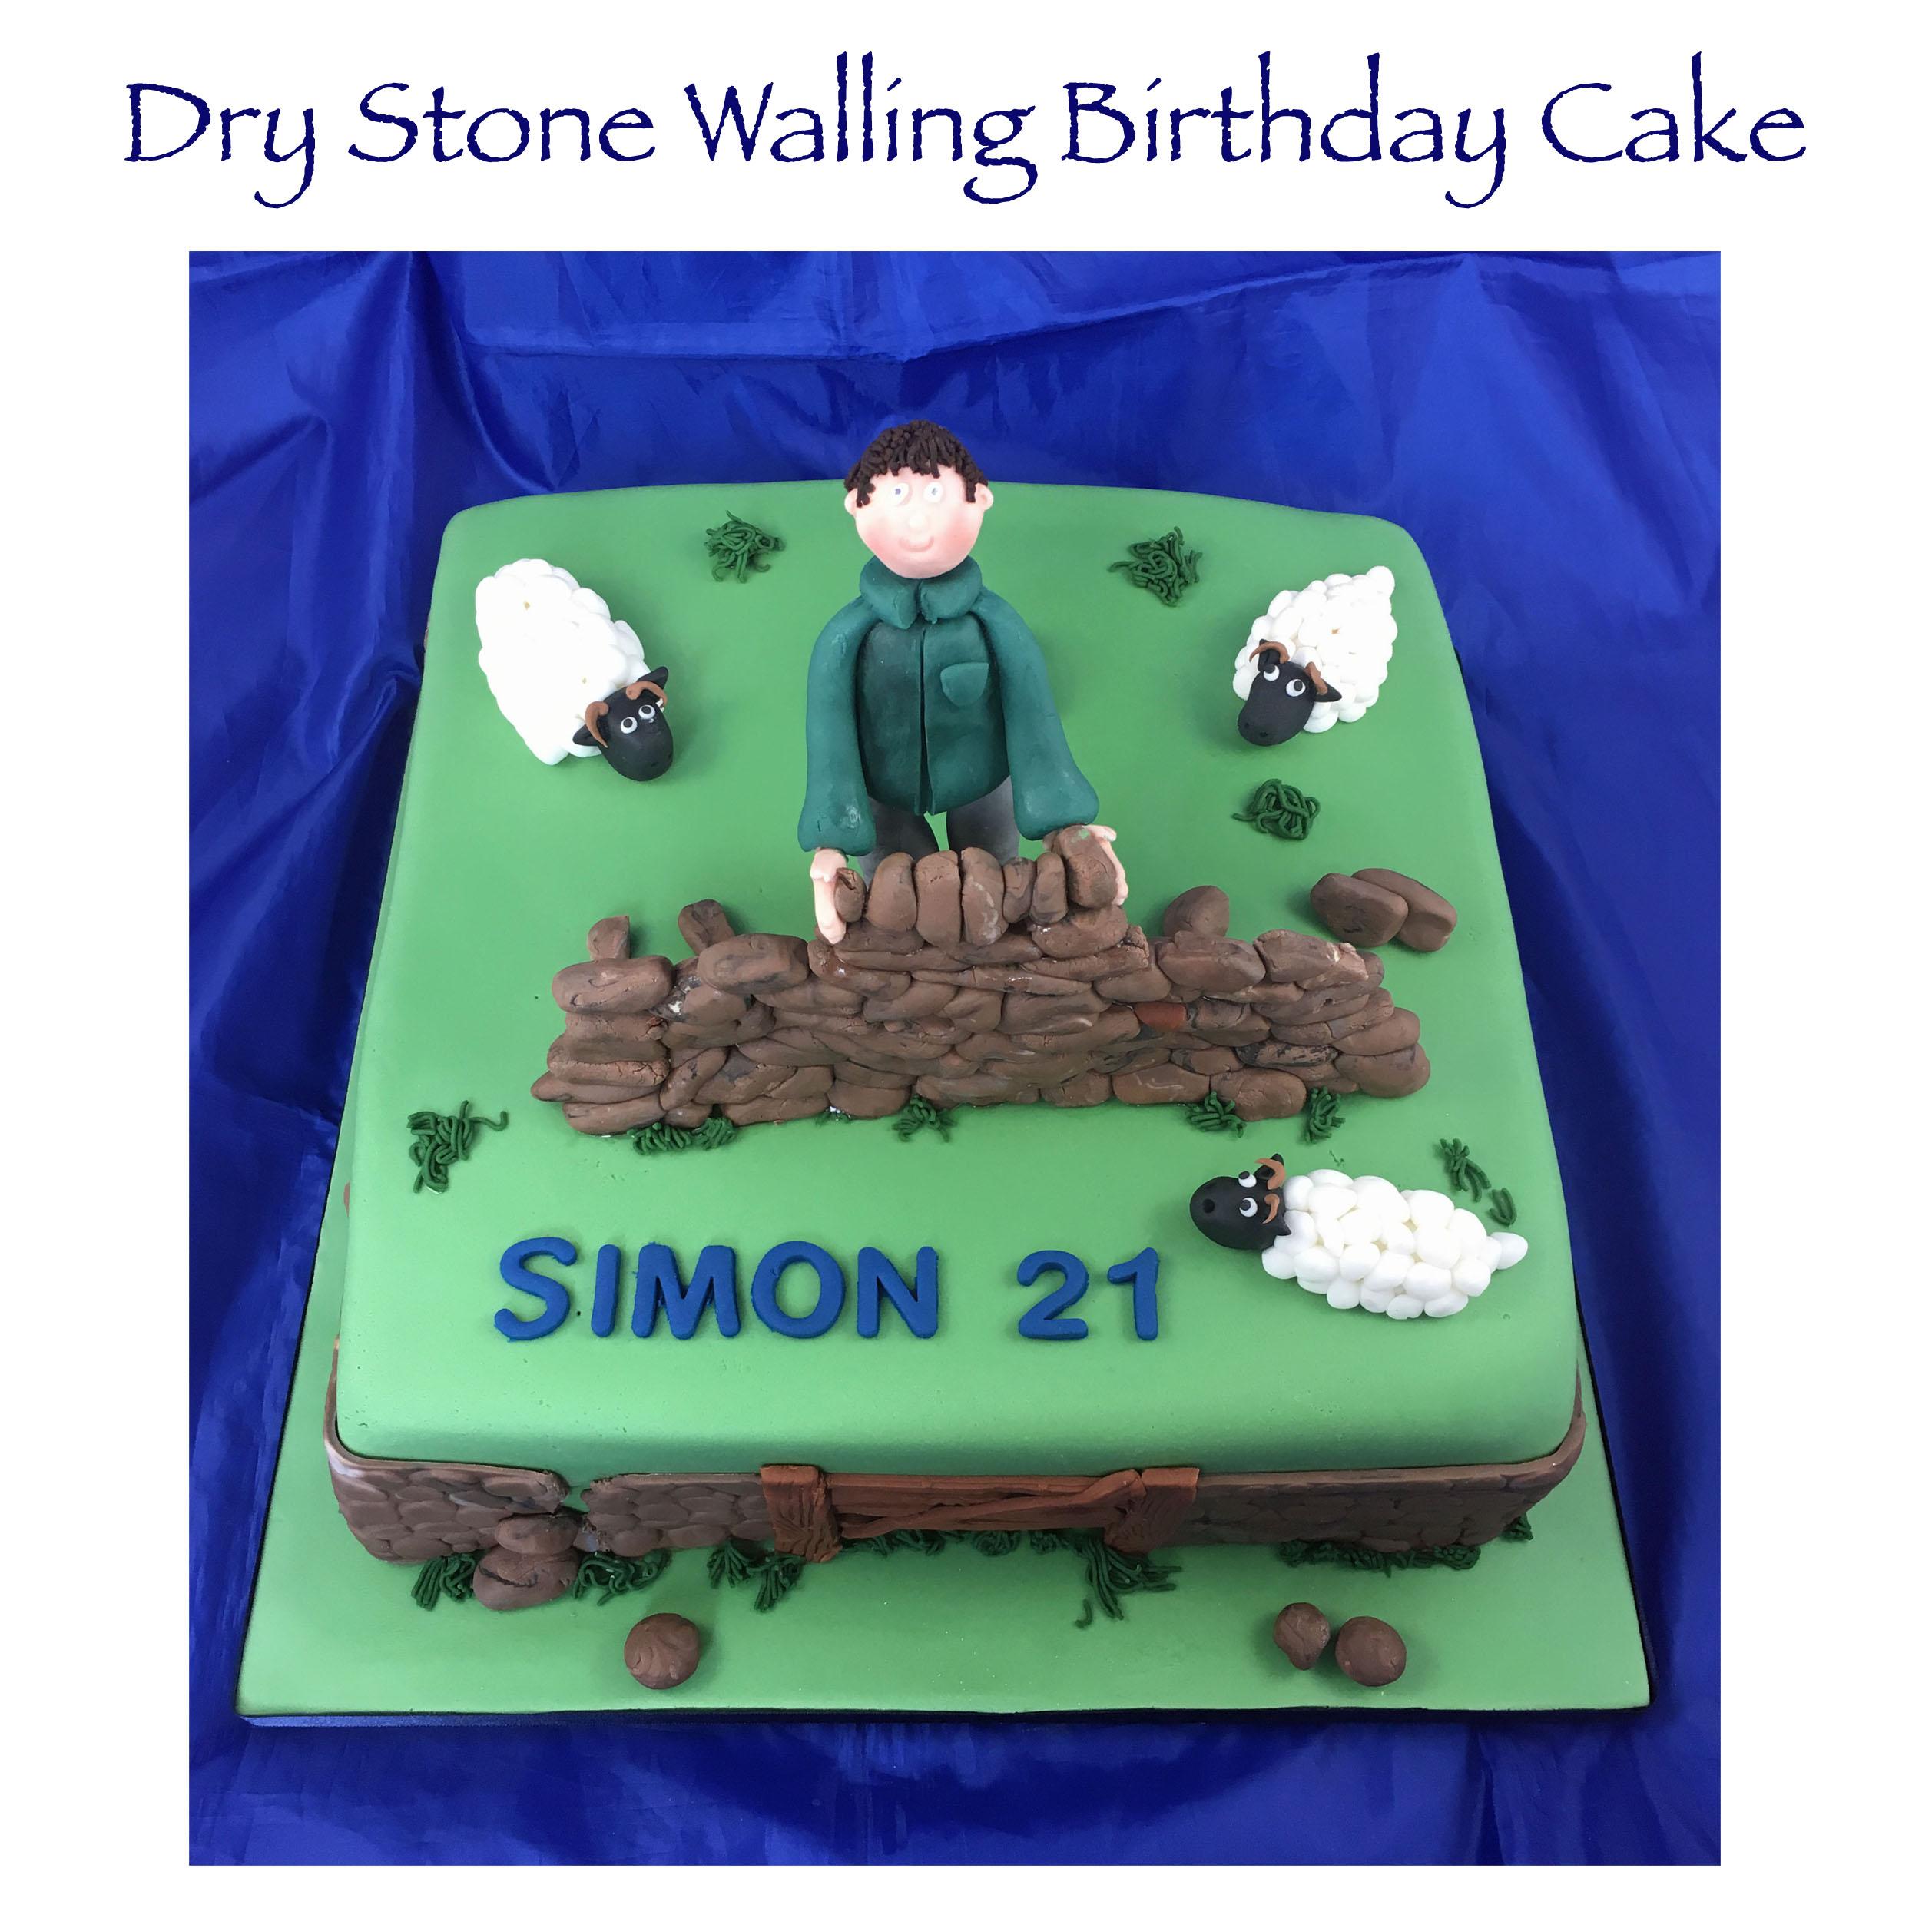 Dry Stone Walling Cake